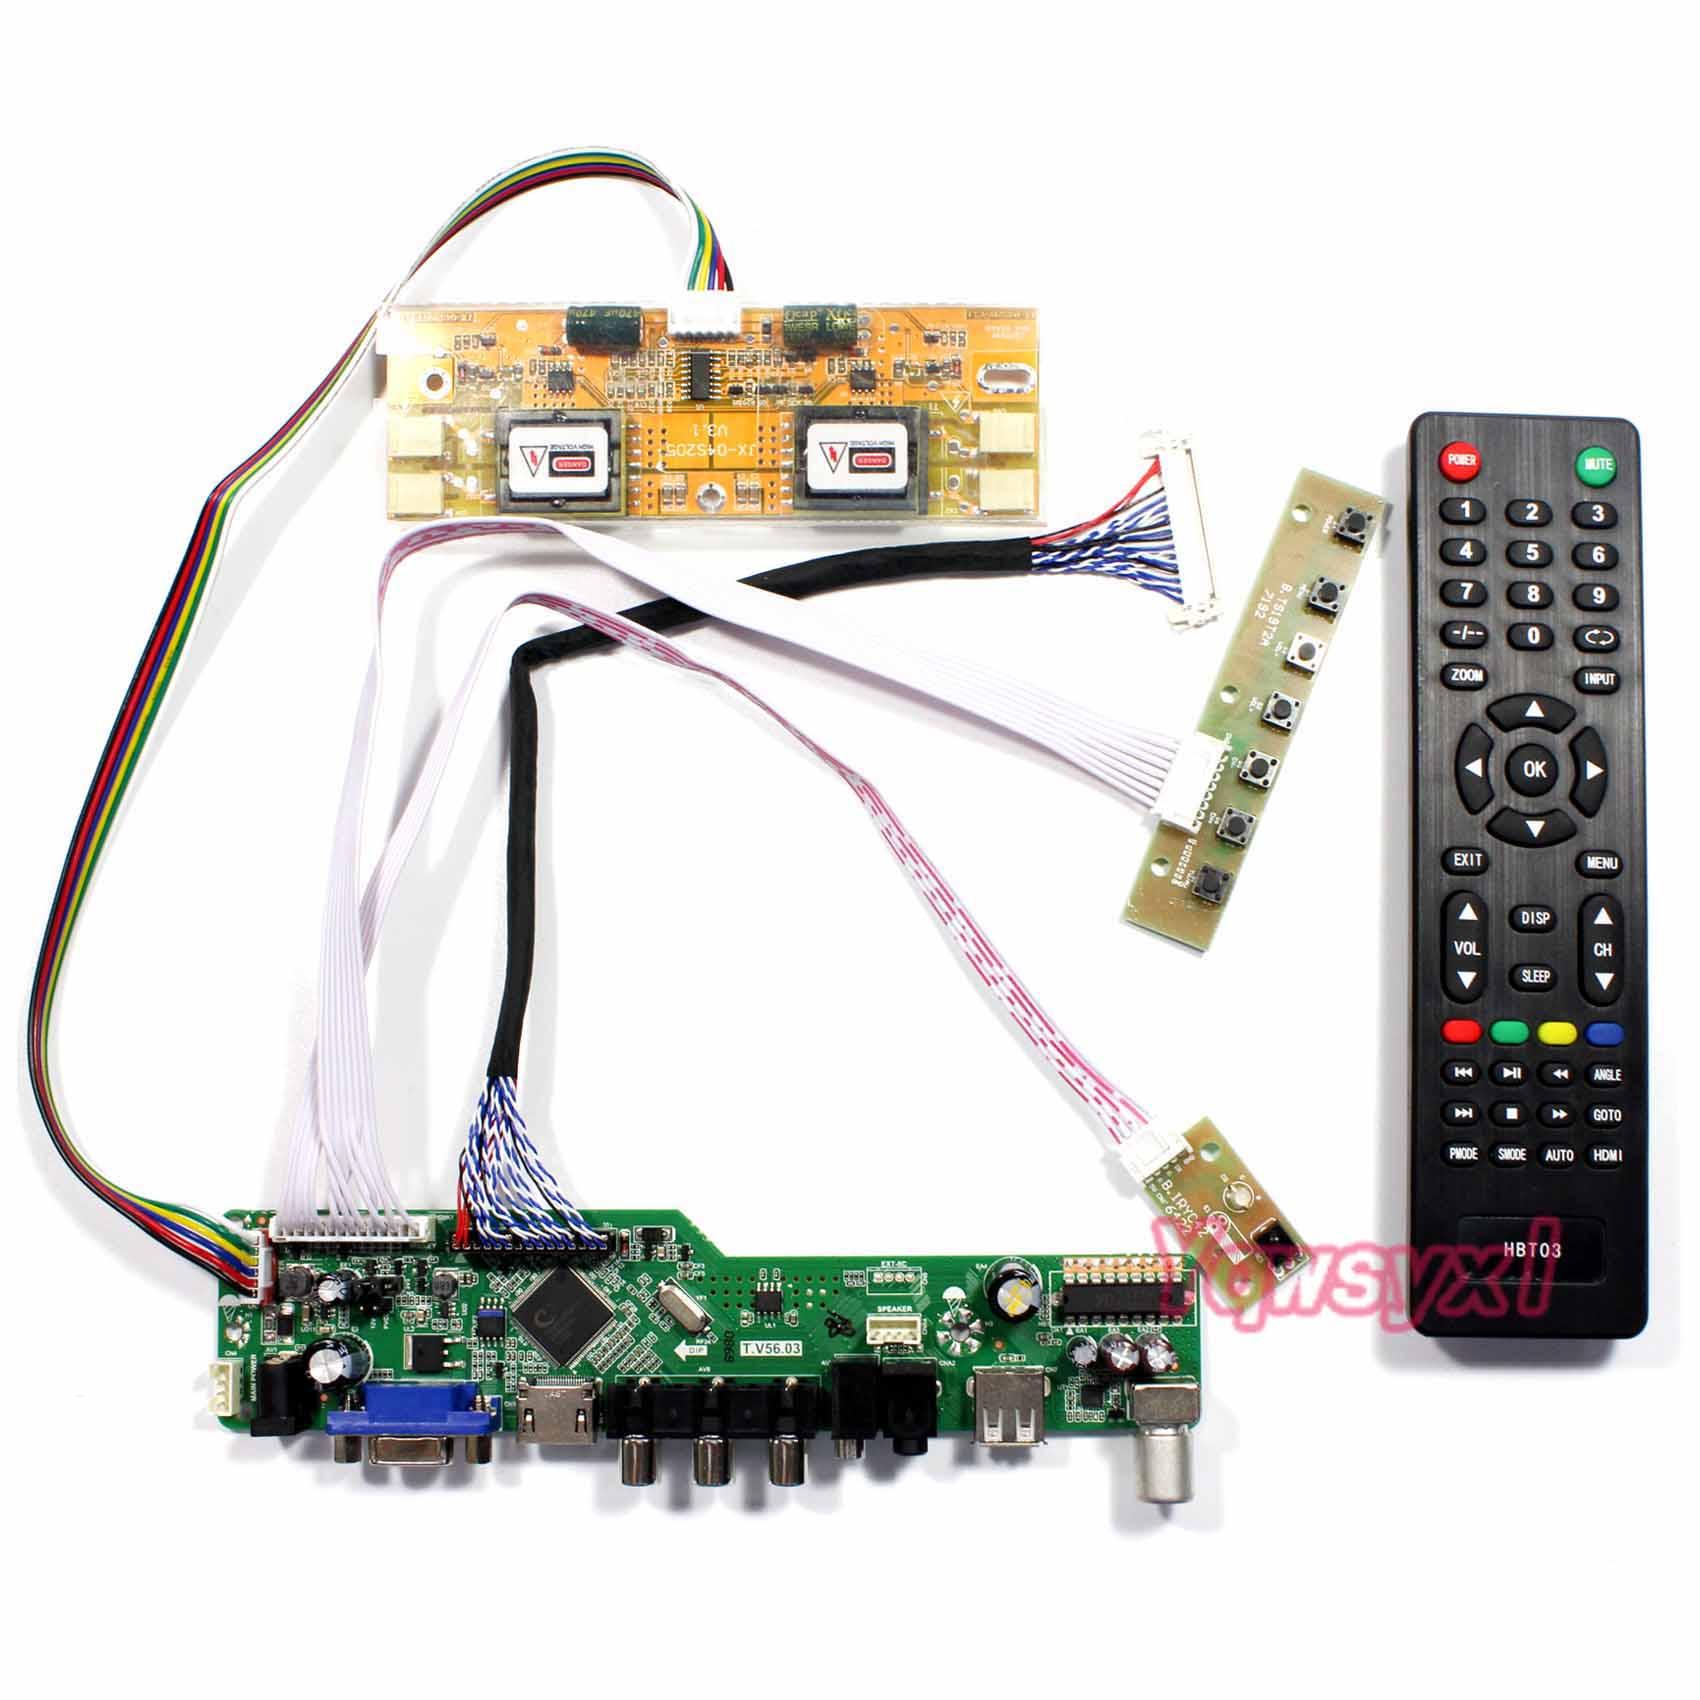 Yqwsyxl Kit For M215HW01 V.0 V0  TV+HDMI+VGA+AV+USB LCD LED Screen Controller Driver Board